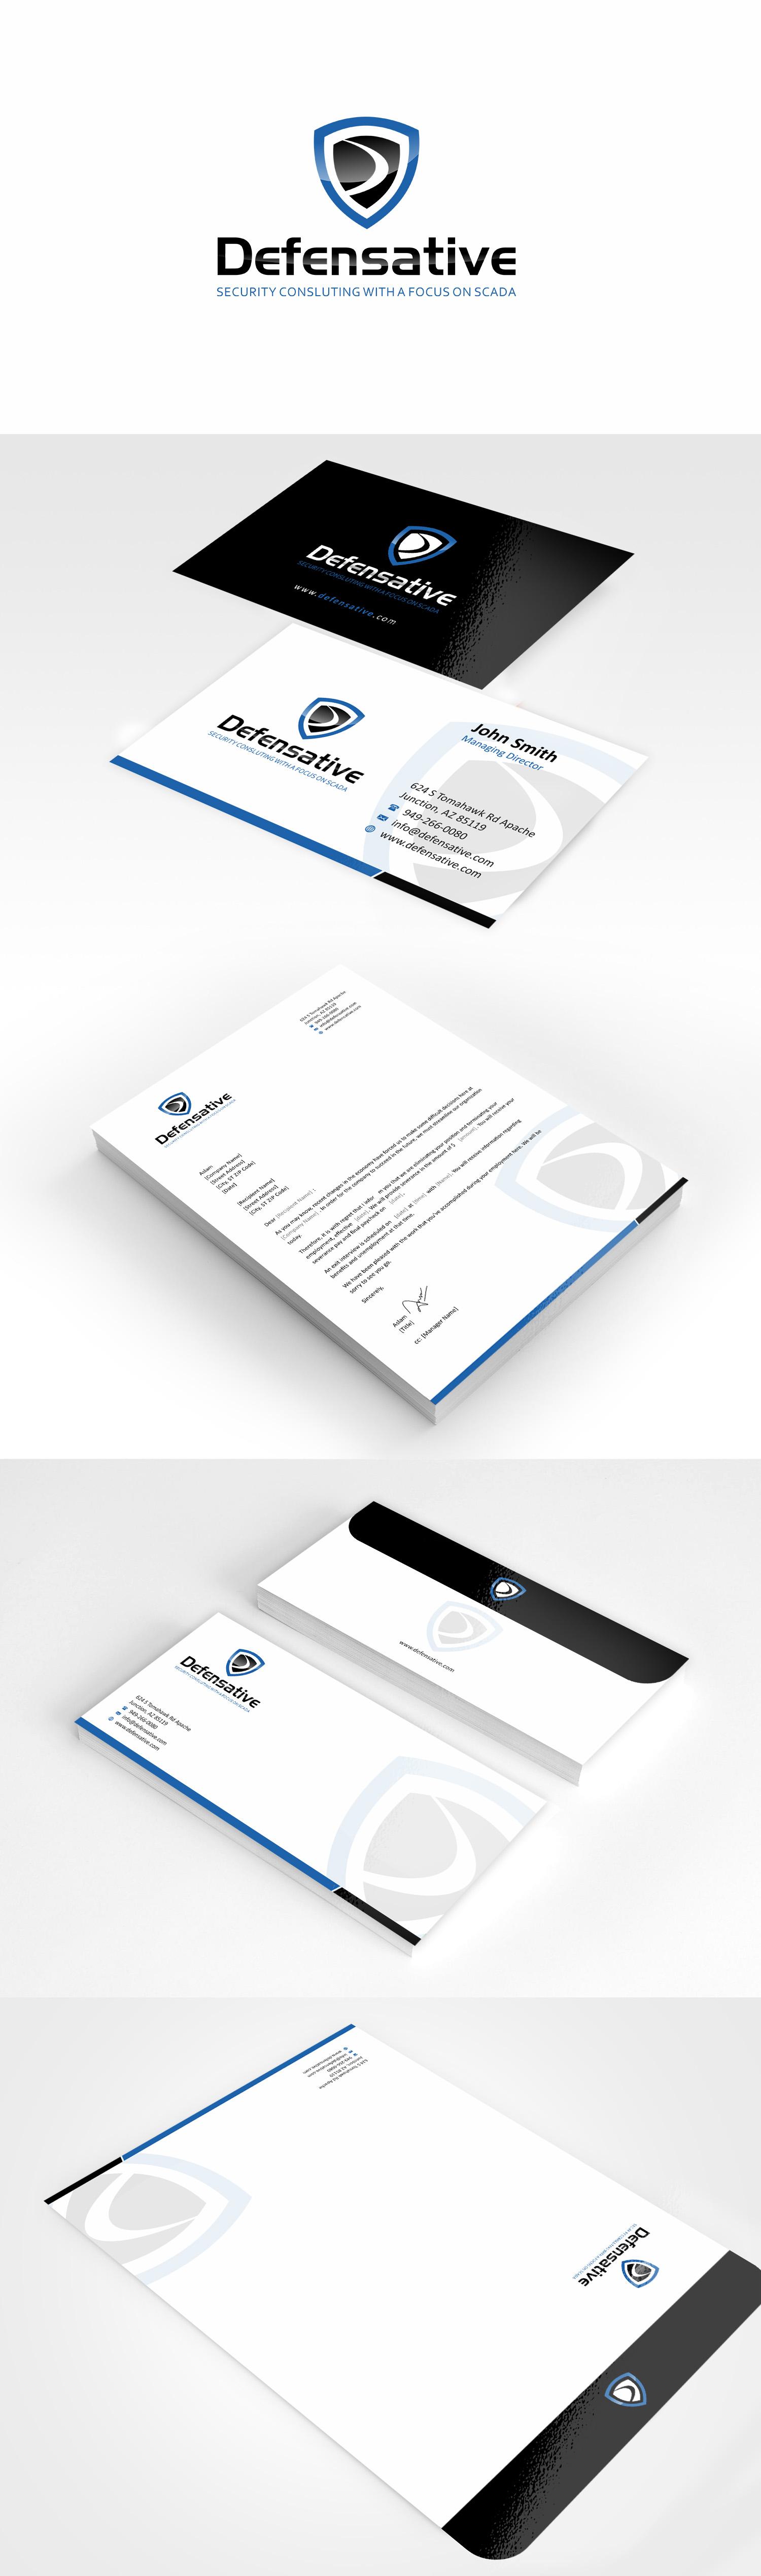 Custom Design by Muhammad Aslam - Entry No. 22 in the Custom Design Contest Custom Design Business Cards+Logo+Stationary for Defensative.